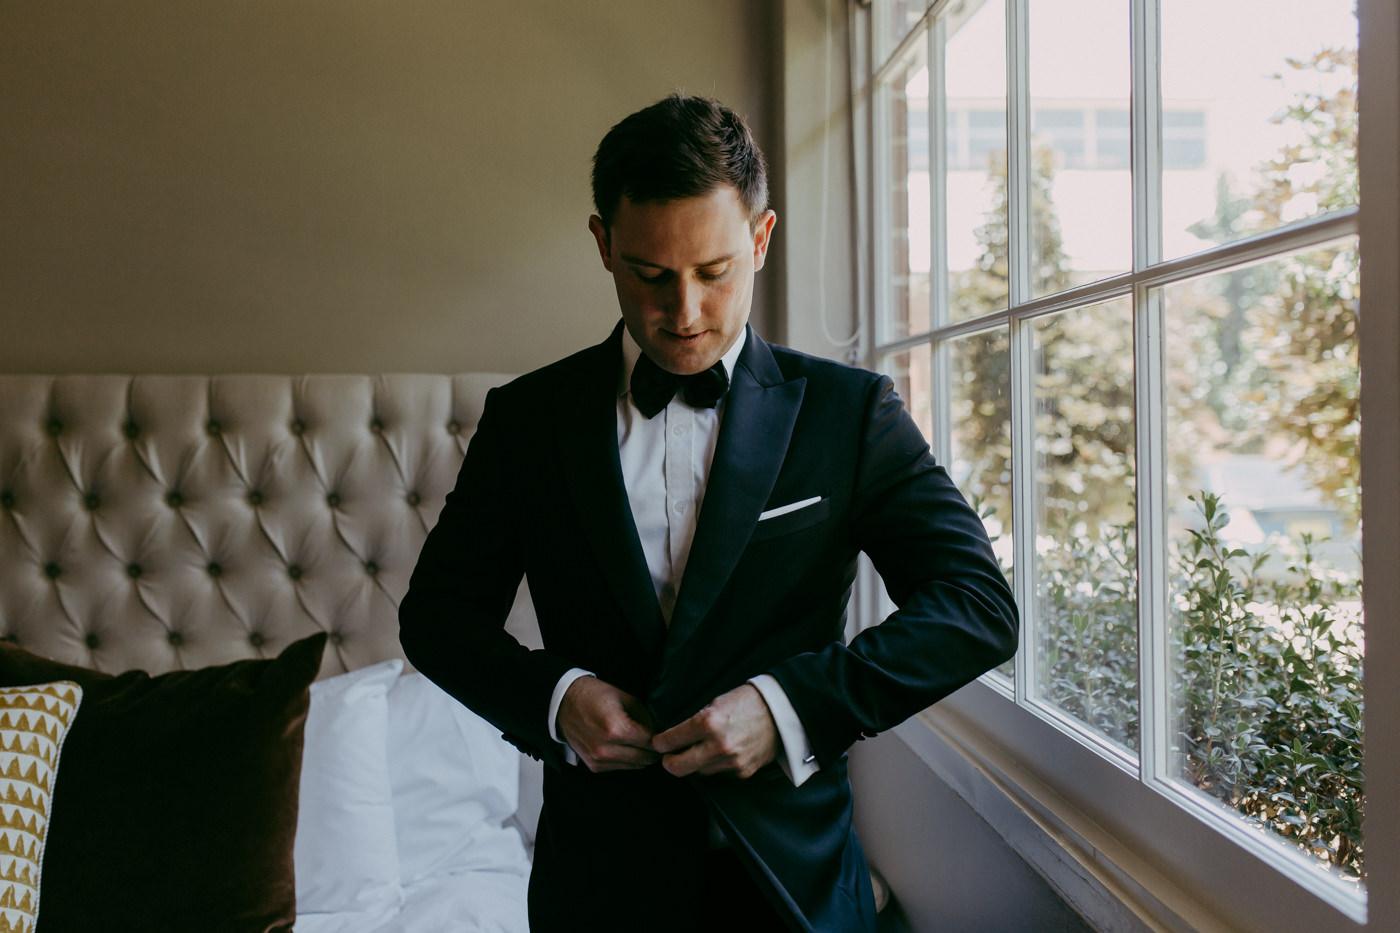 Anthony & Eliet - Wagga Wagga Wedding - Country NSW - Samantha Heather Photography-7.jpg